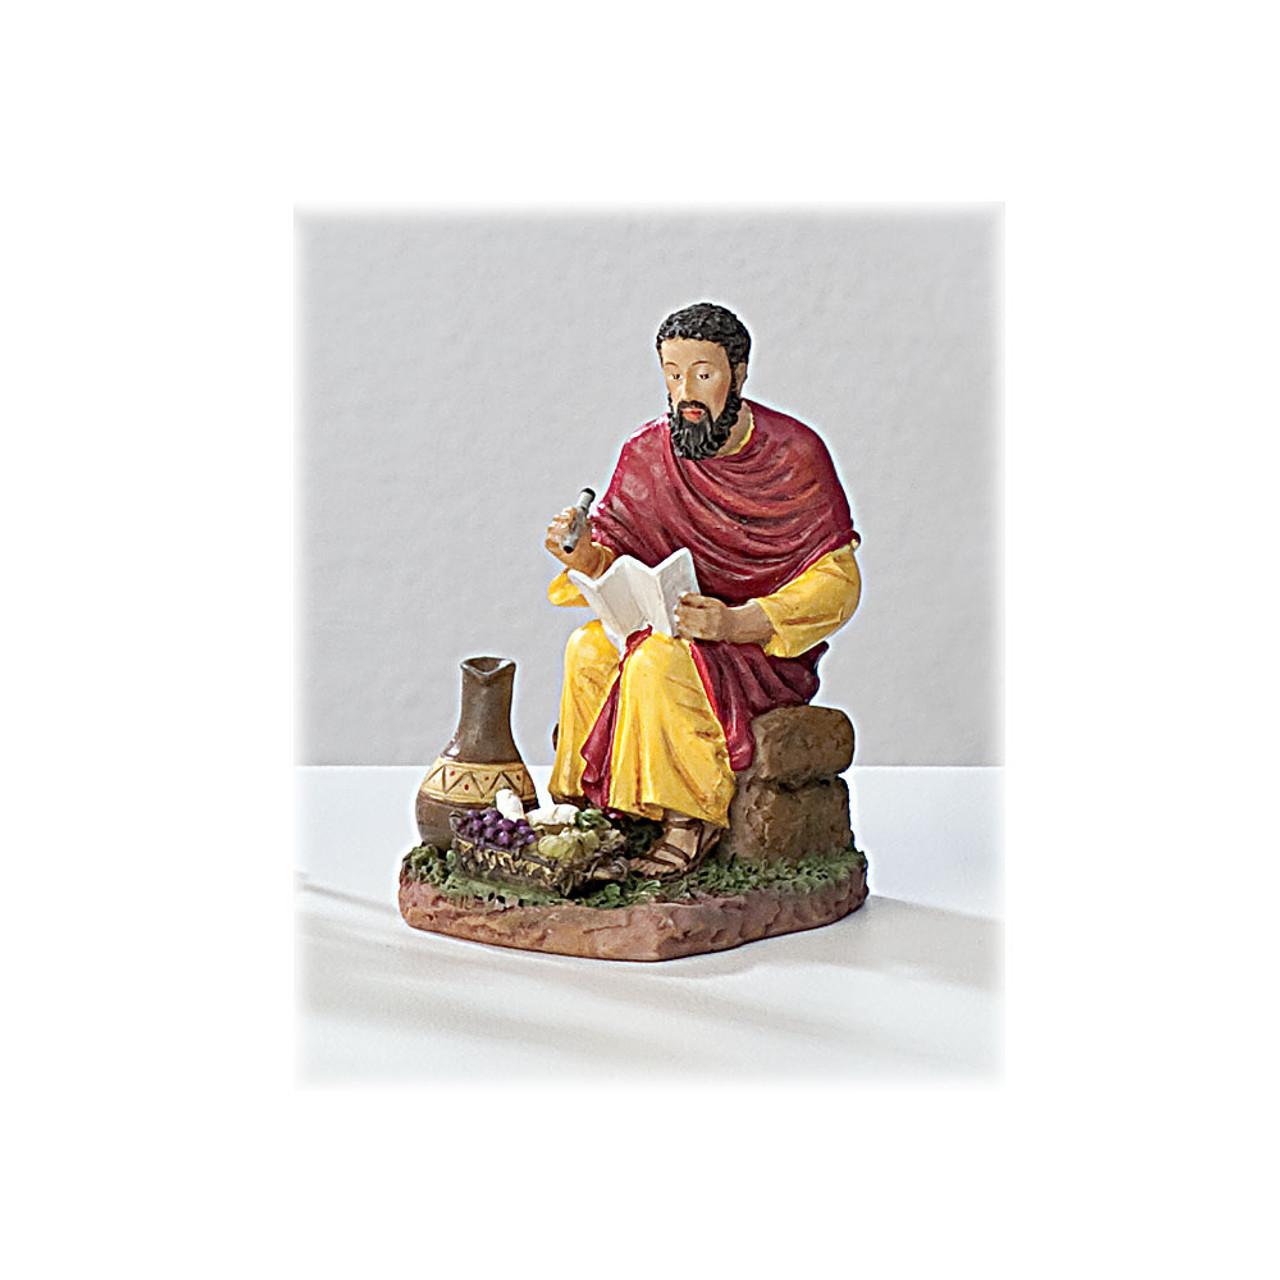 St Matthew 4 Inch Resin Statue